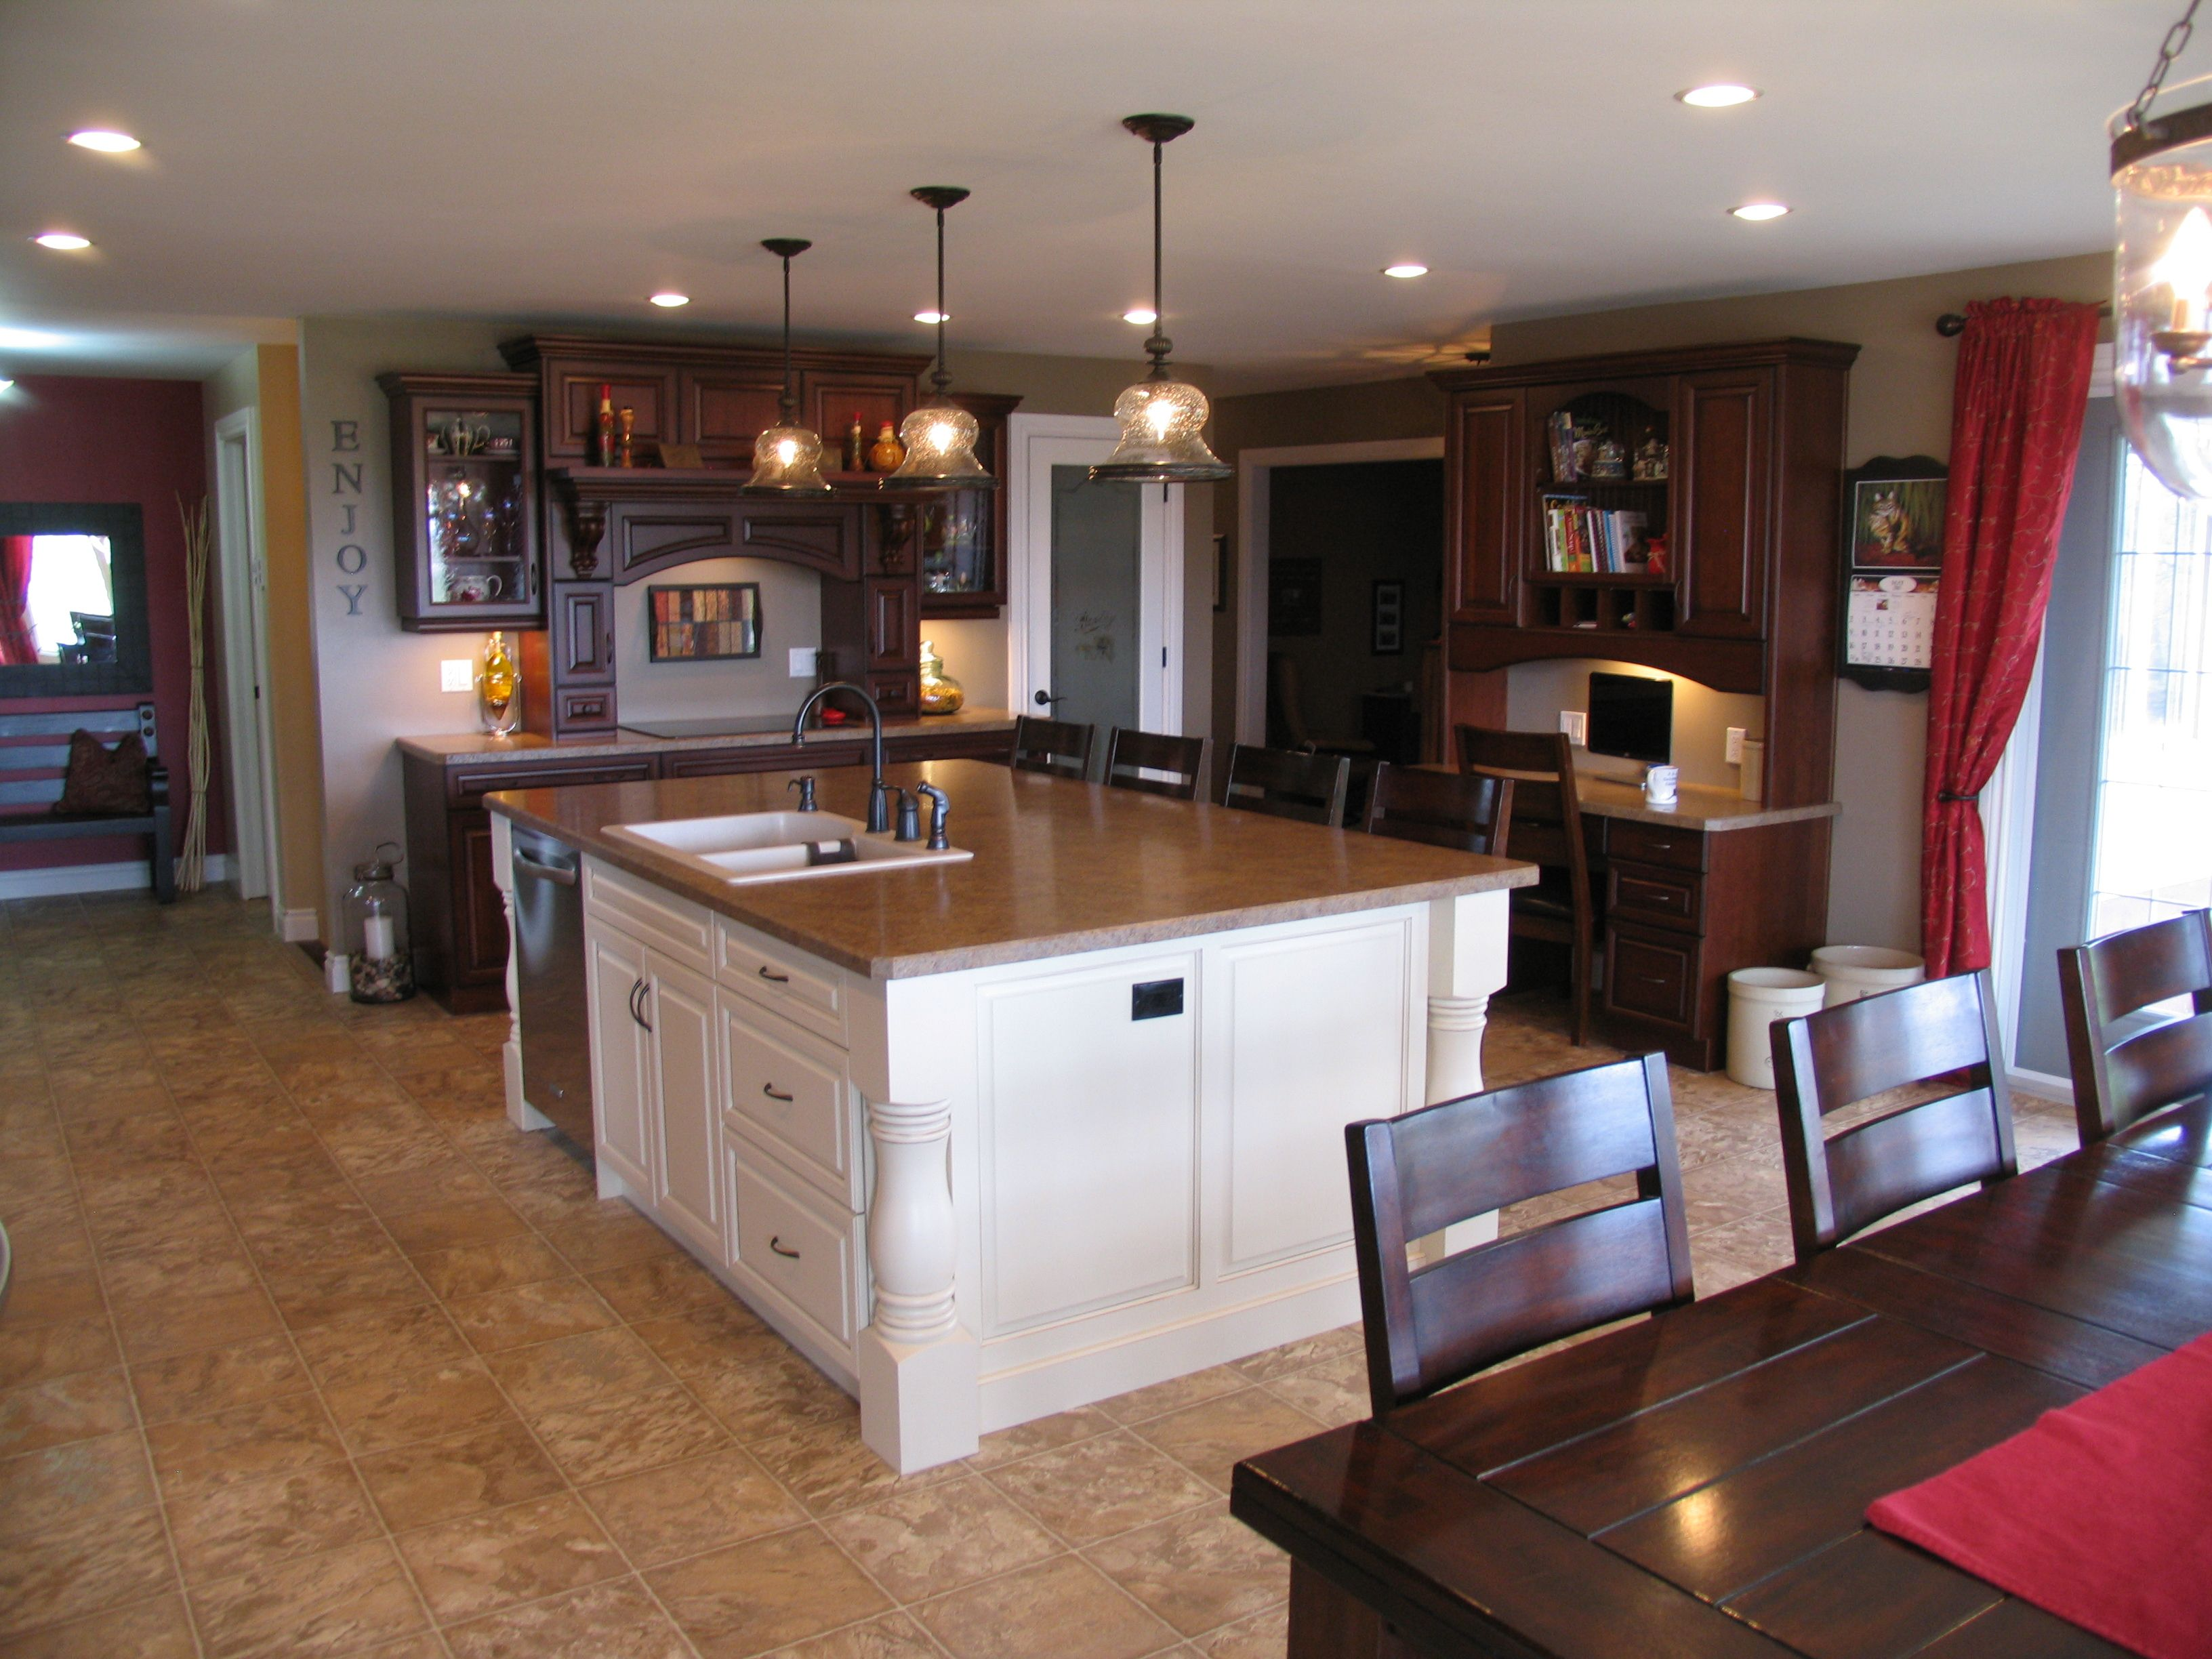 kitchen cabinets: cherry - saddlebrown, island cabinets: maple